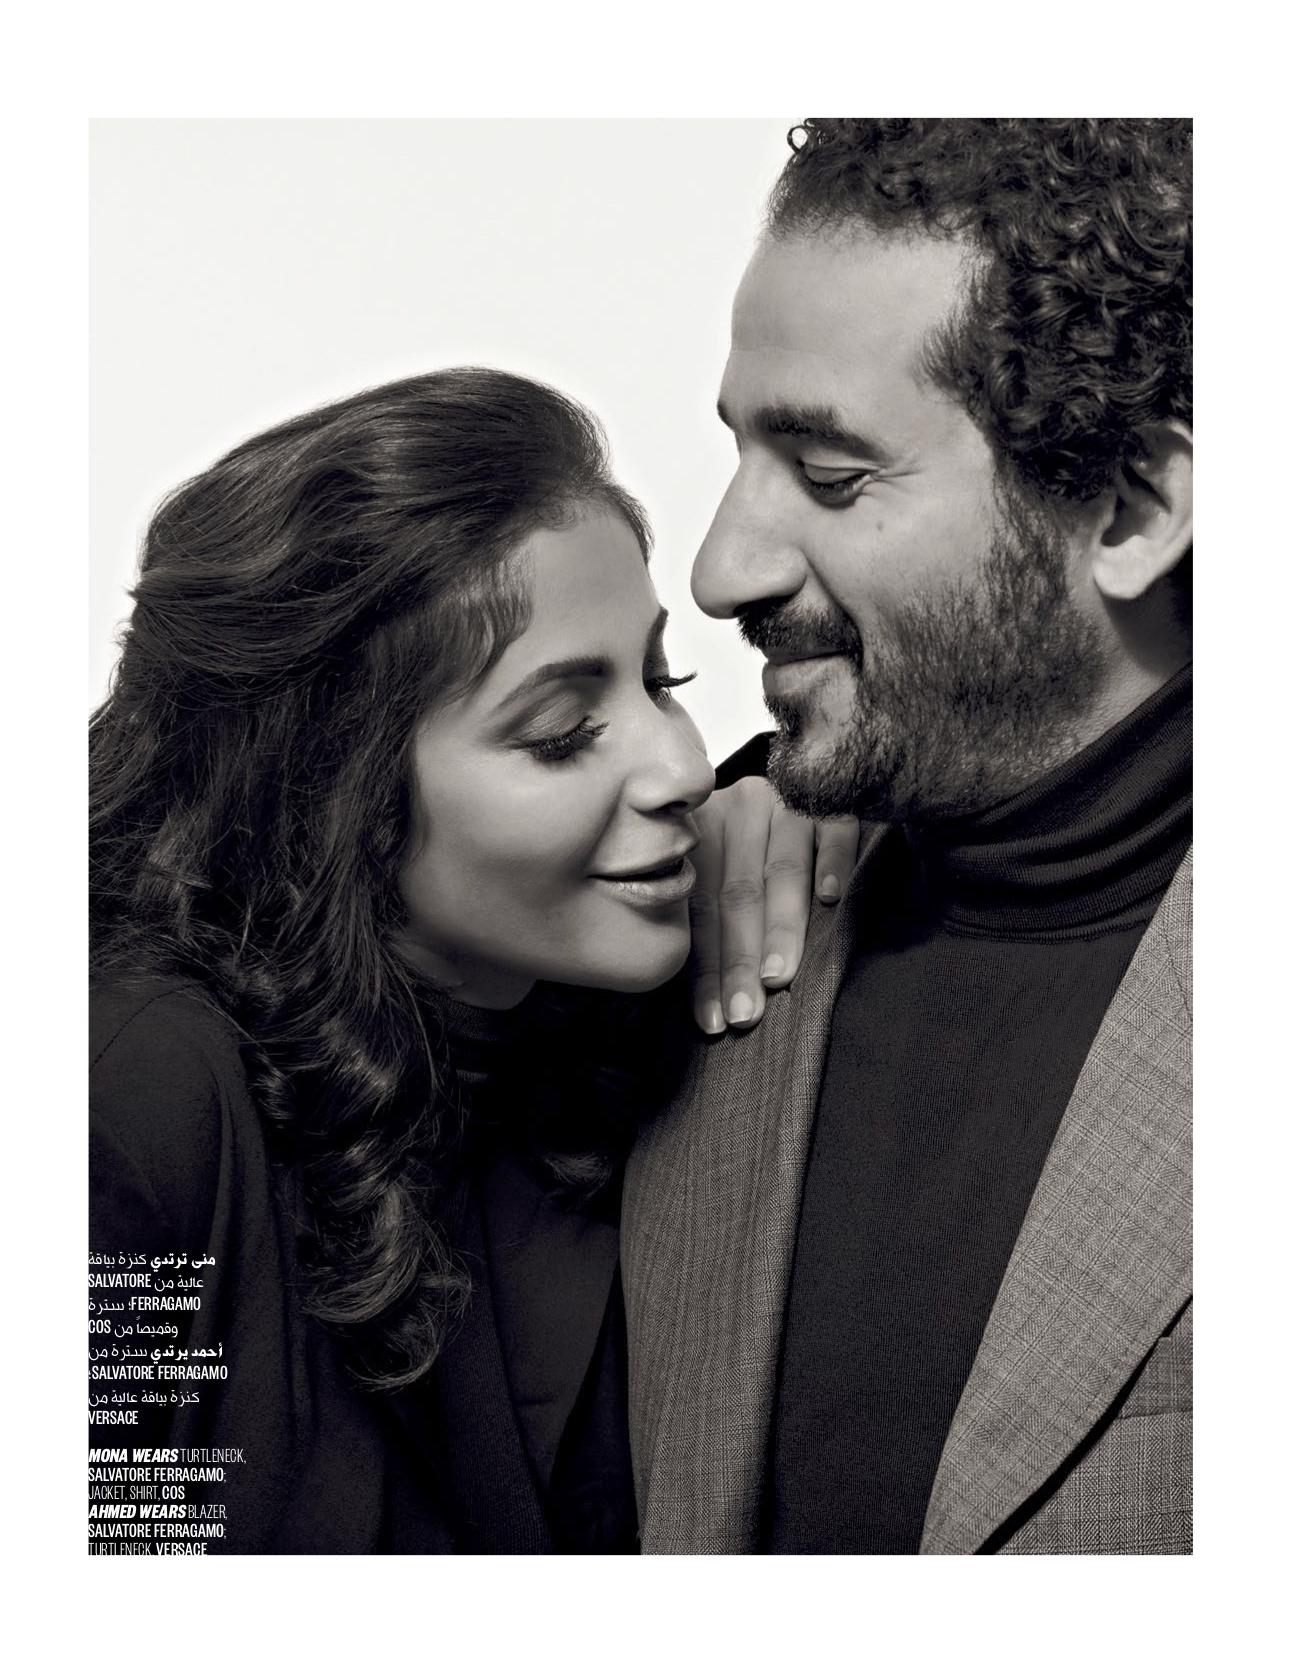 Mona Zaki & Ahmed Helmy x Vogue Arabia